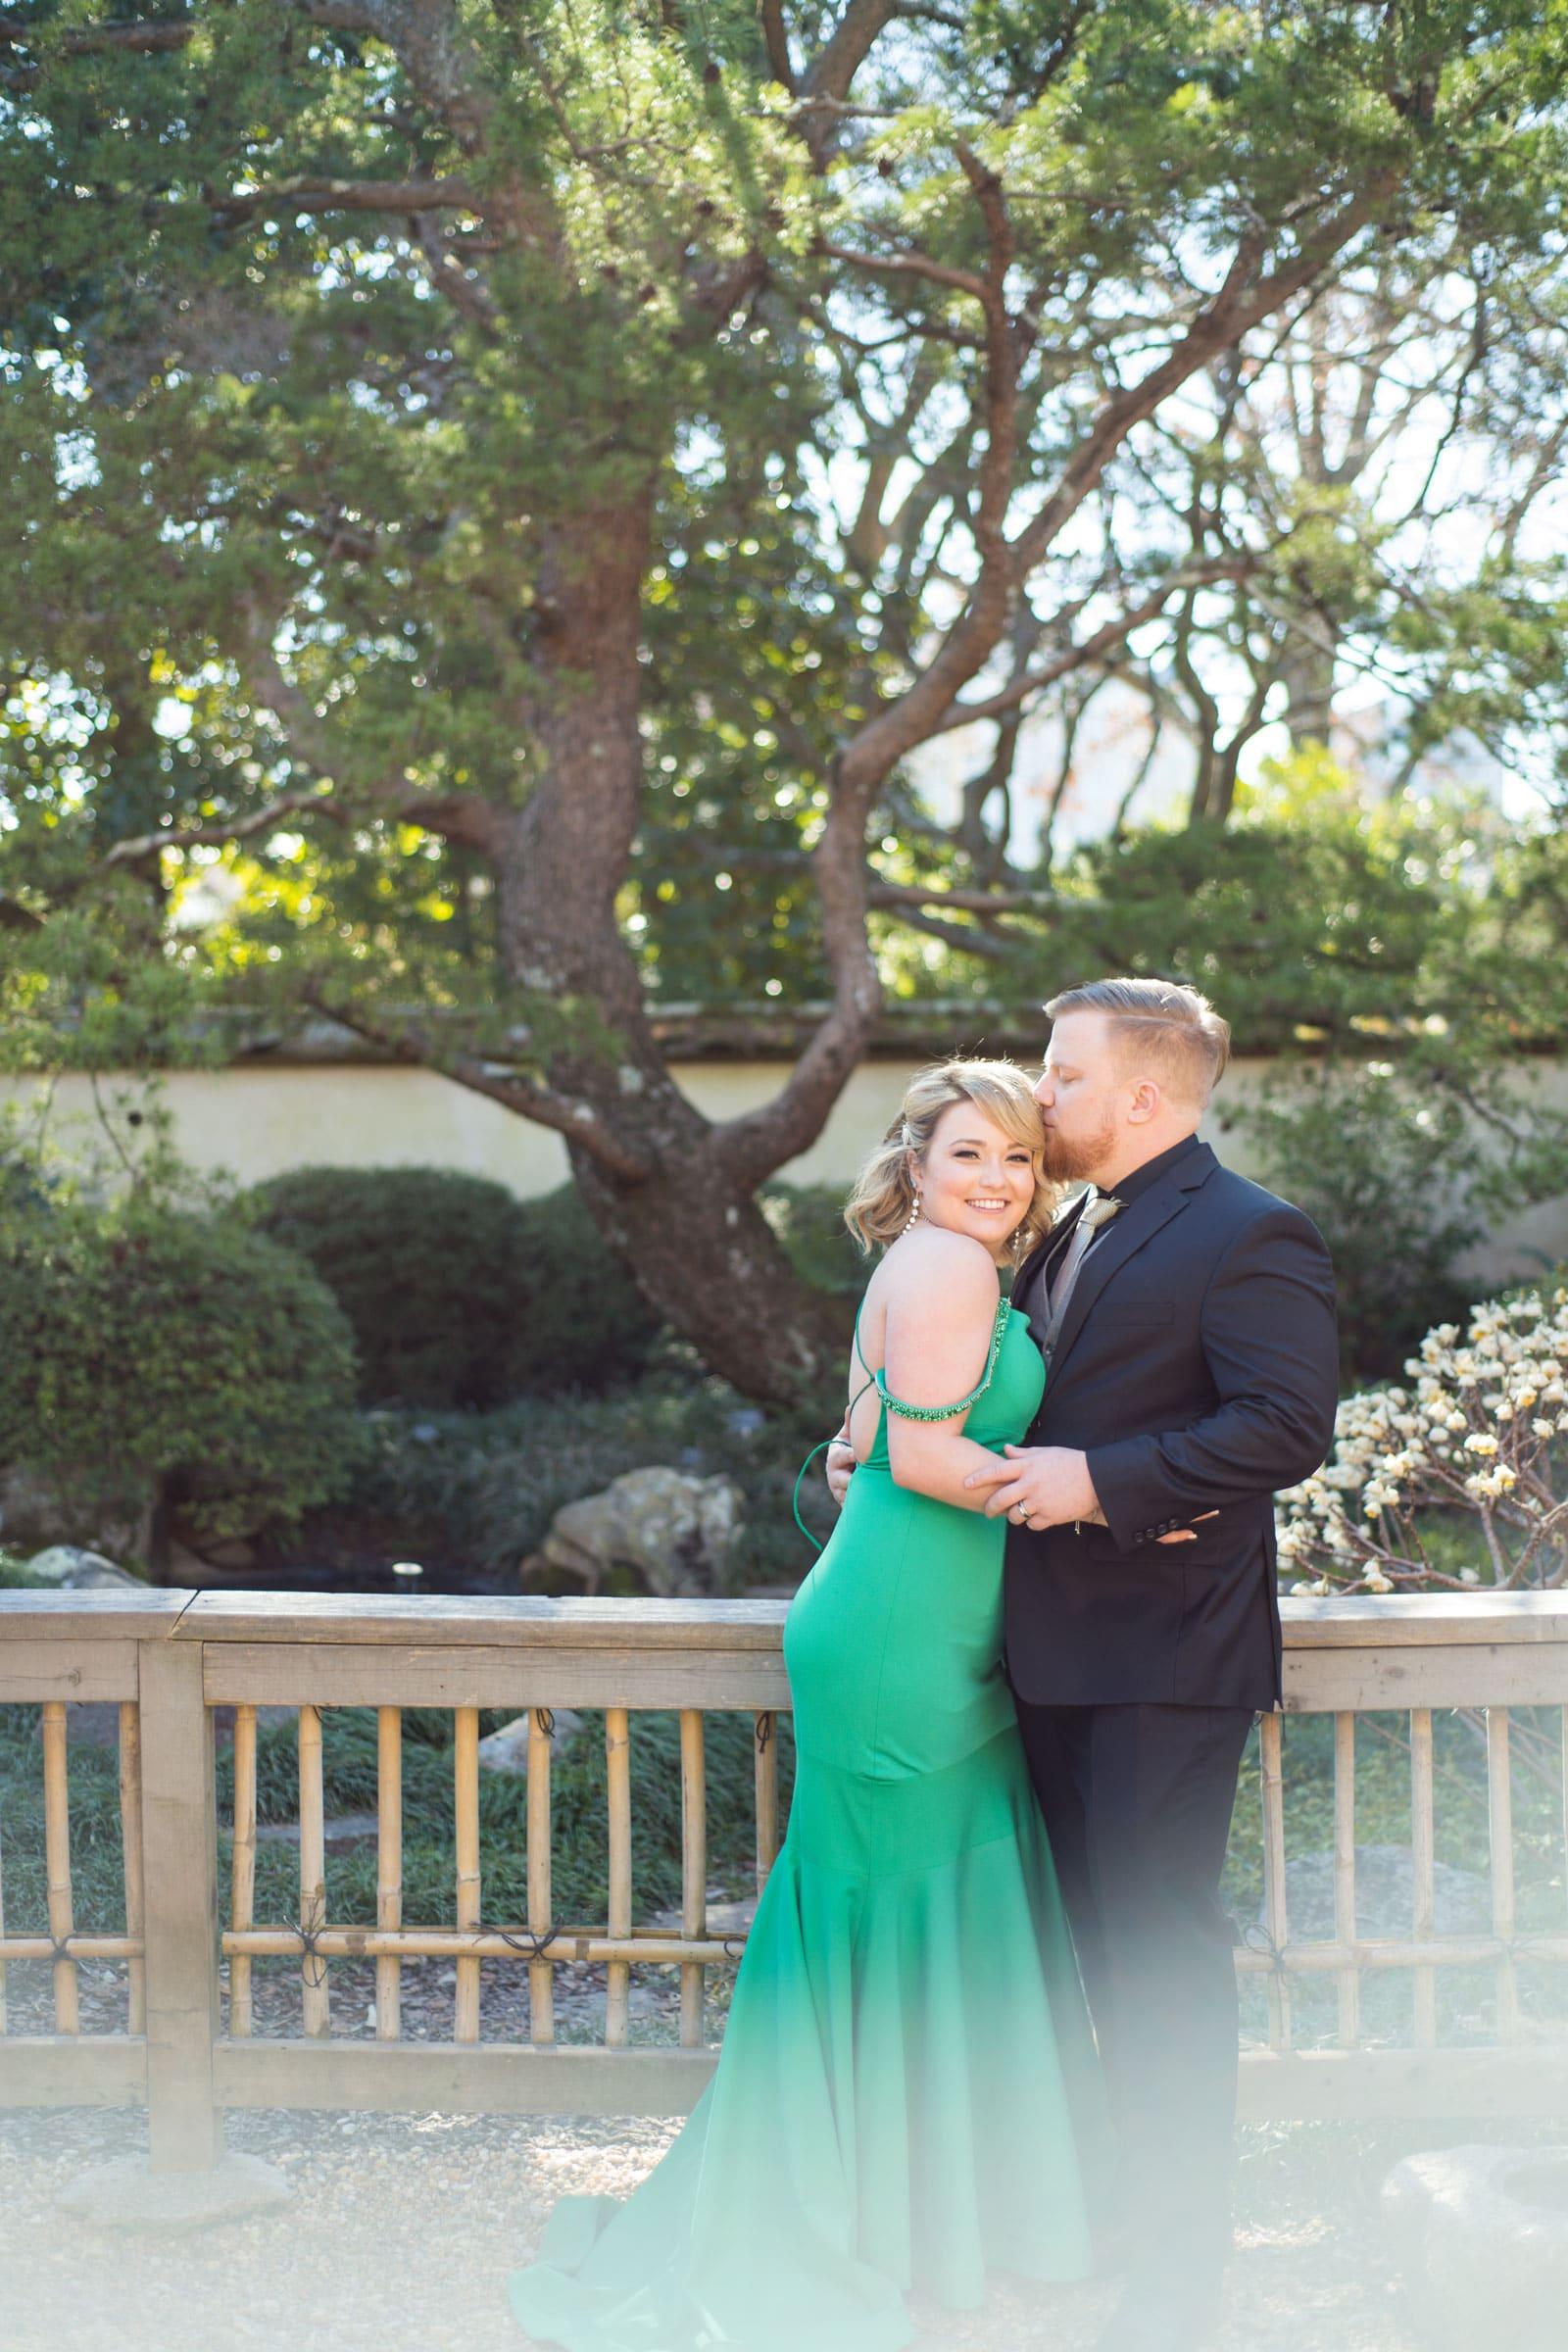 married couple poses on wooden bridge in Atlanta gardens